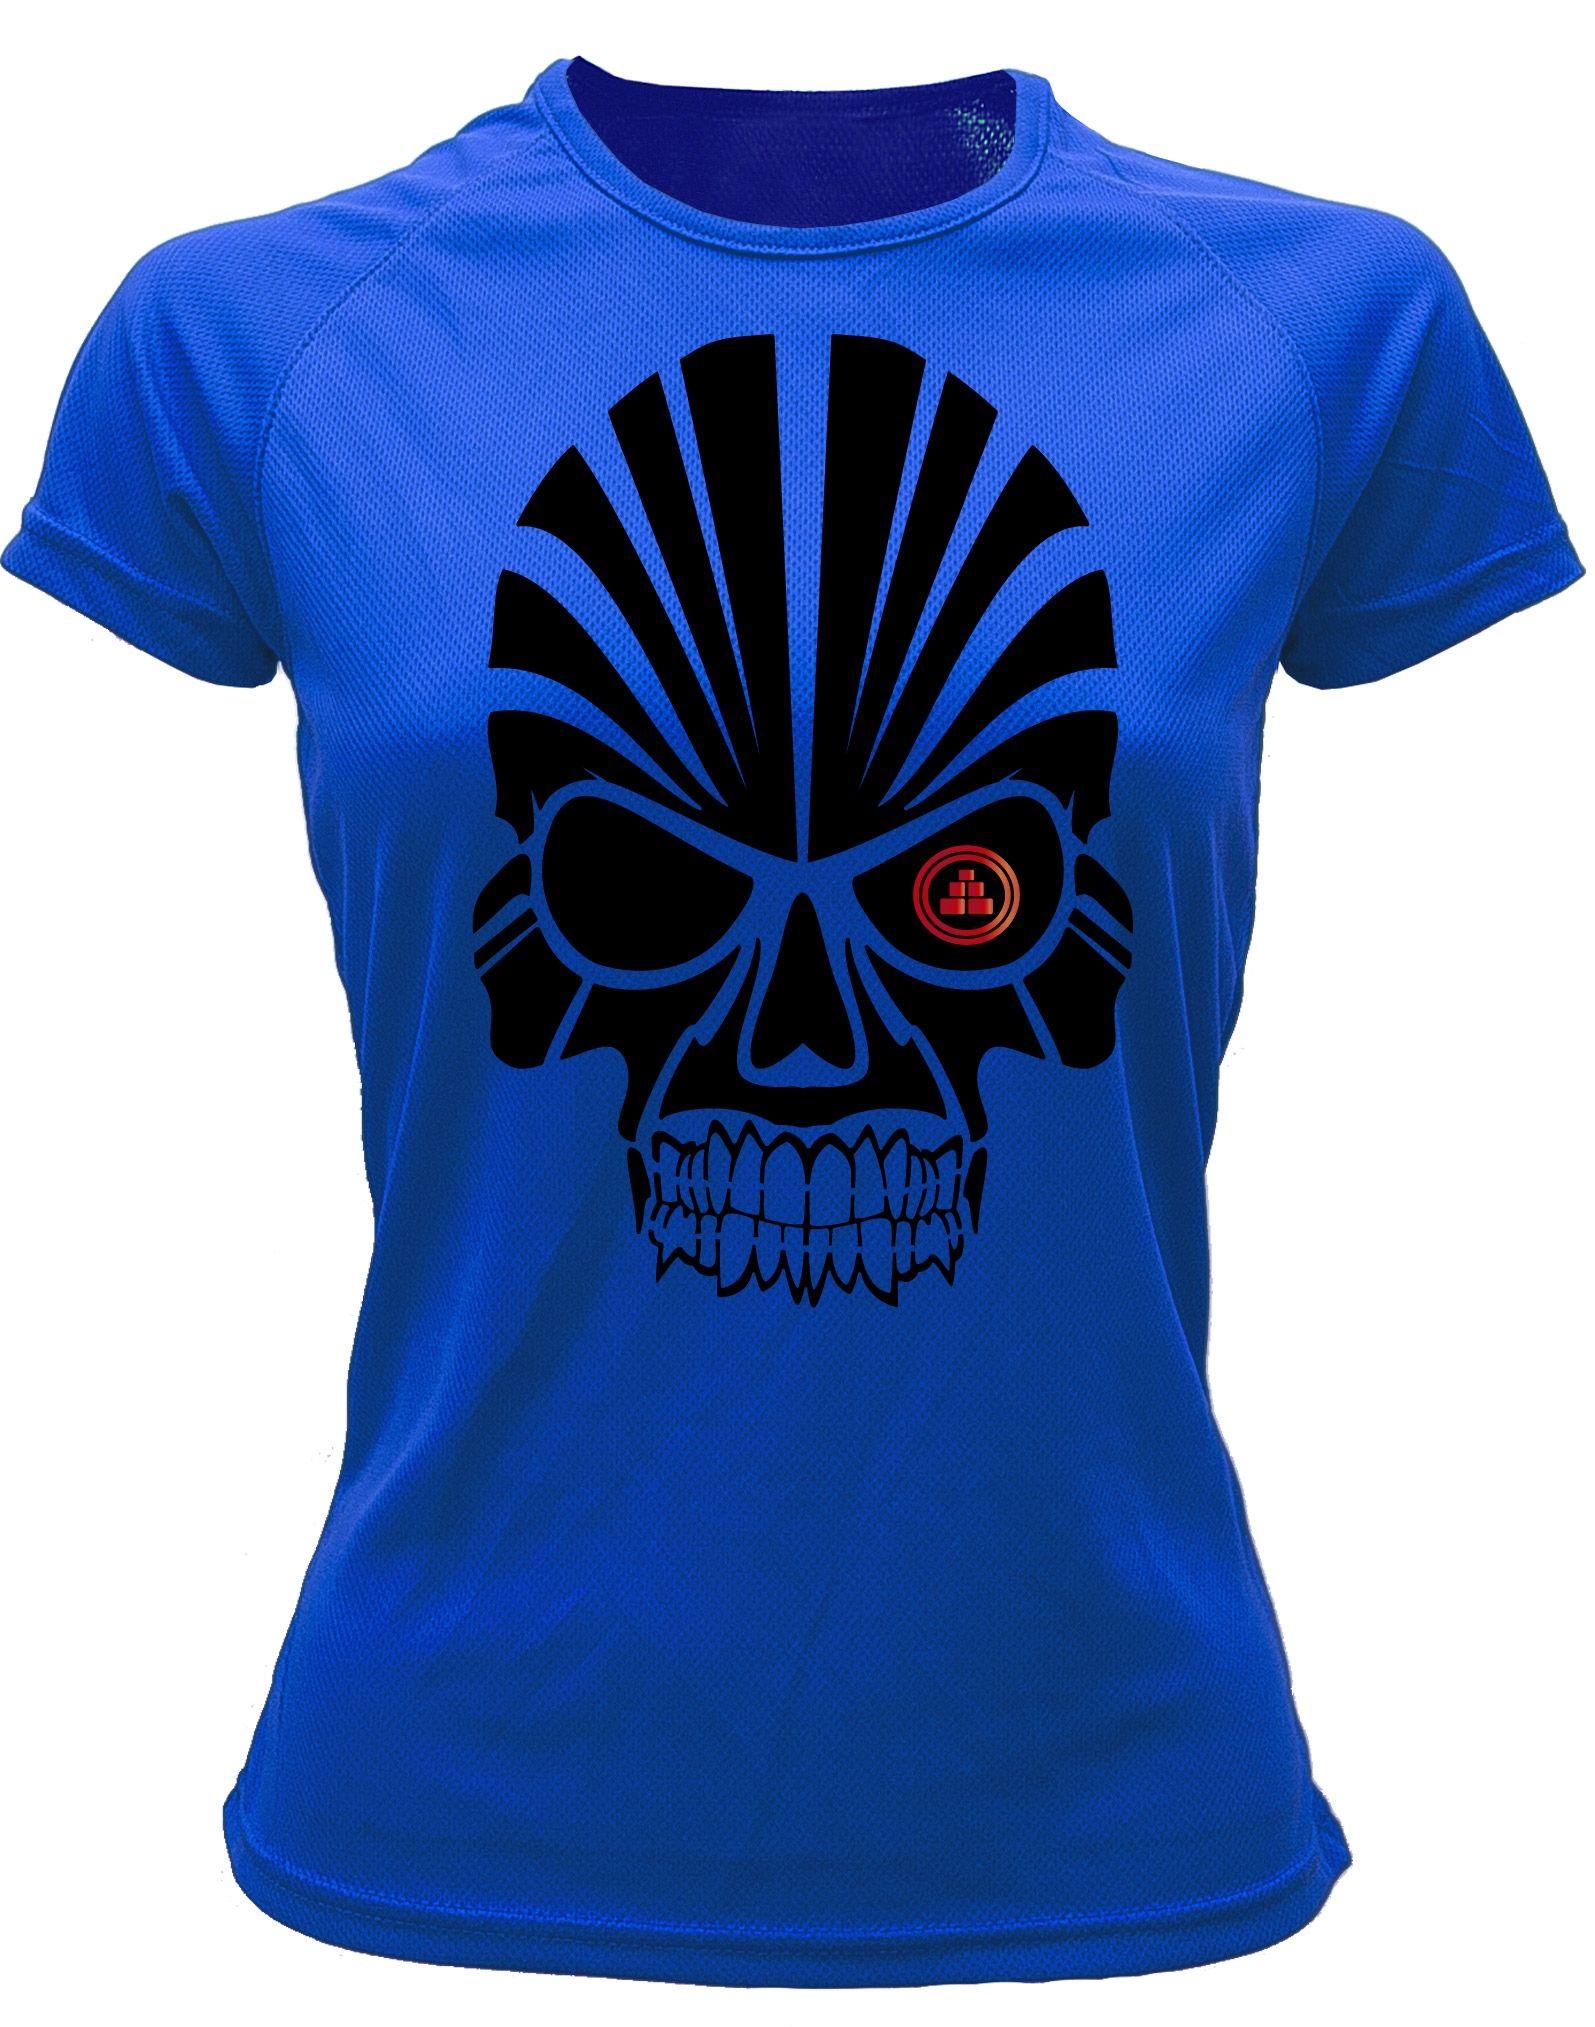 Camiseta deportiva Mujer calavera Azul Royal